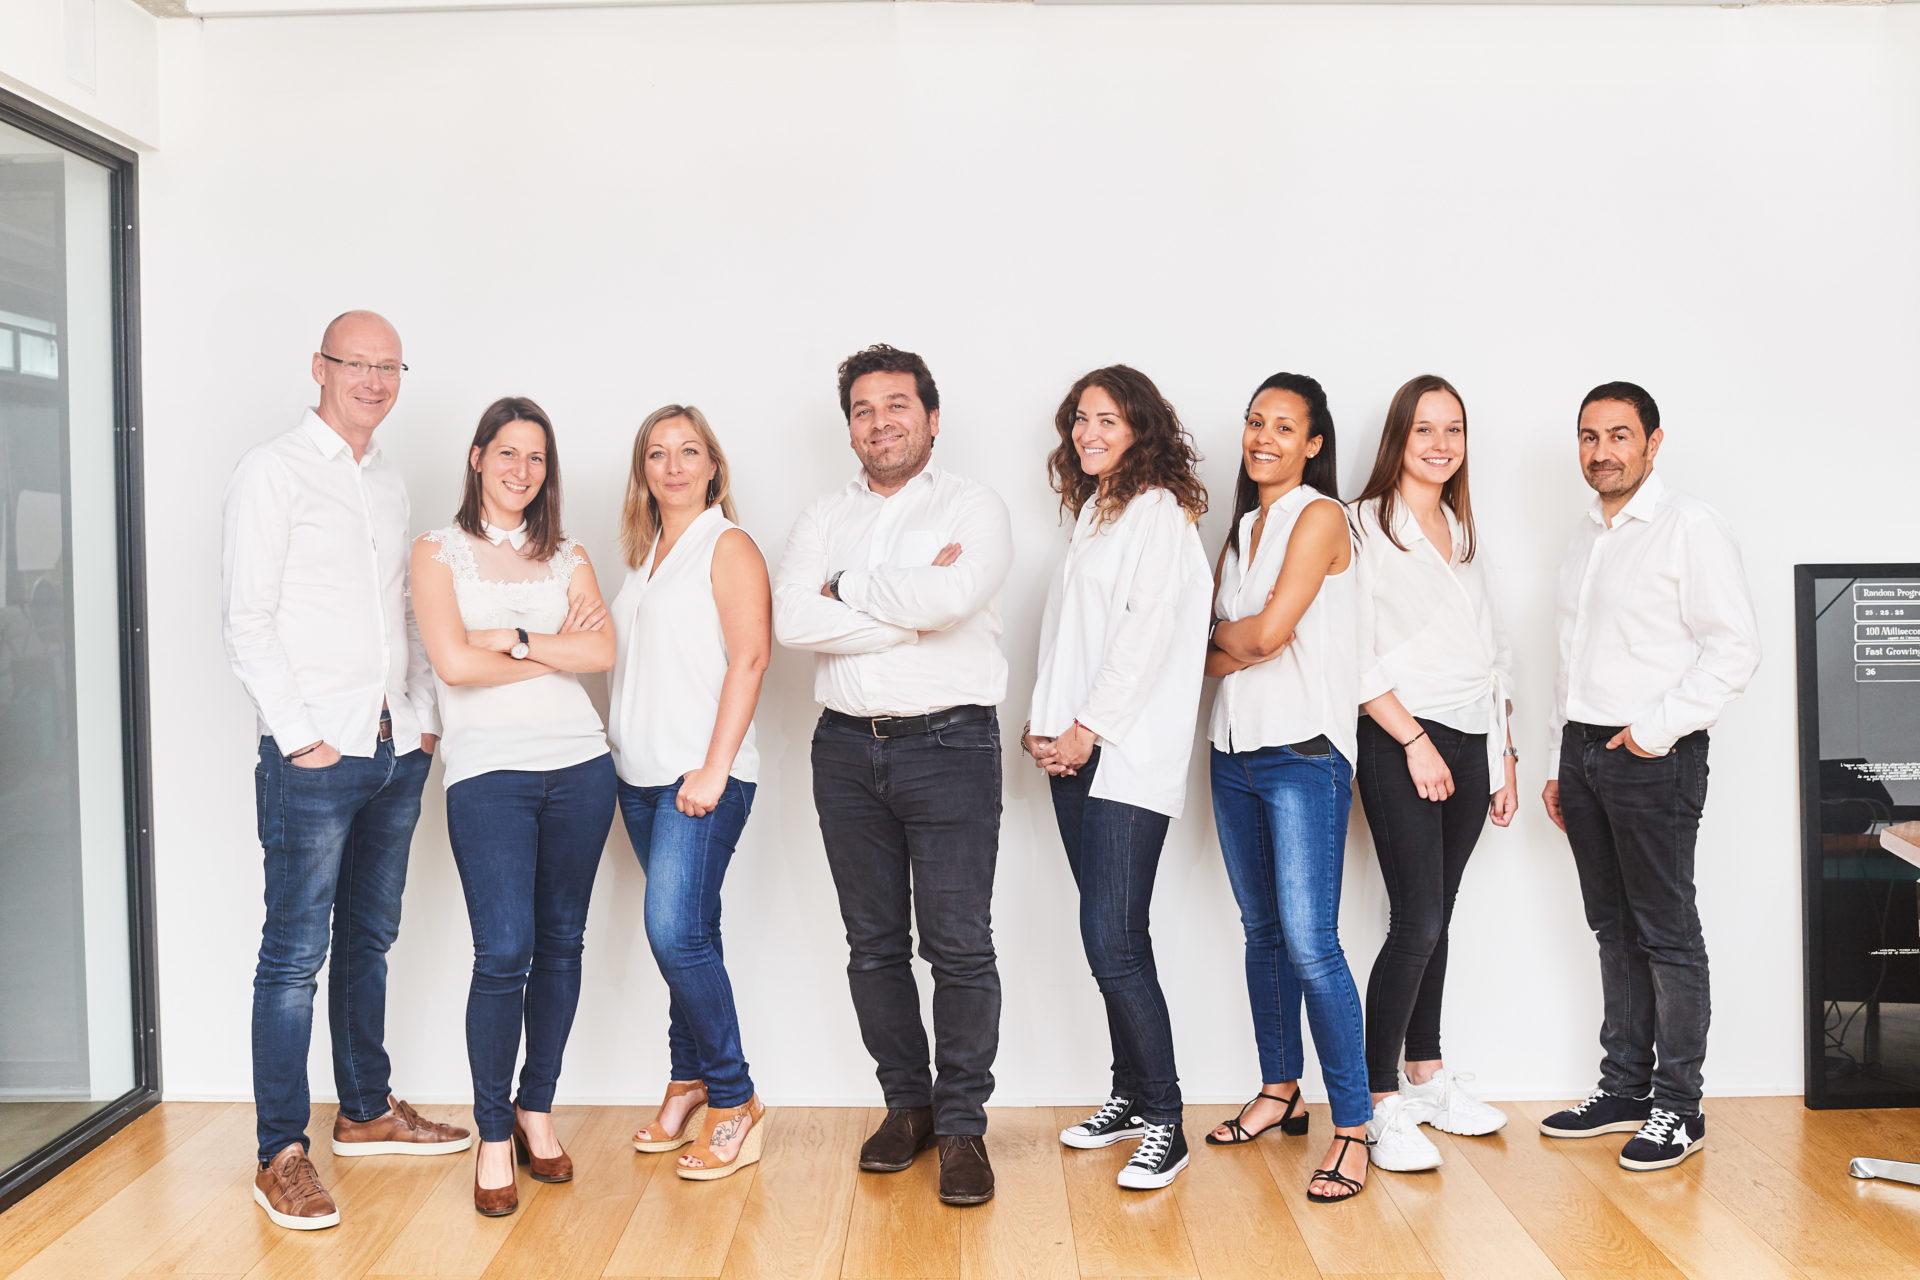 Melissa Simba, Ségolène Vuillaume, Anouk Hirschfeld, Stéphane Benaym, Yves Brami, David Carion, Jade Raedemaecker dans les bureaux d'e-maprod, situés rue Faider 15 à Bruxelles